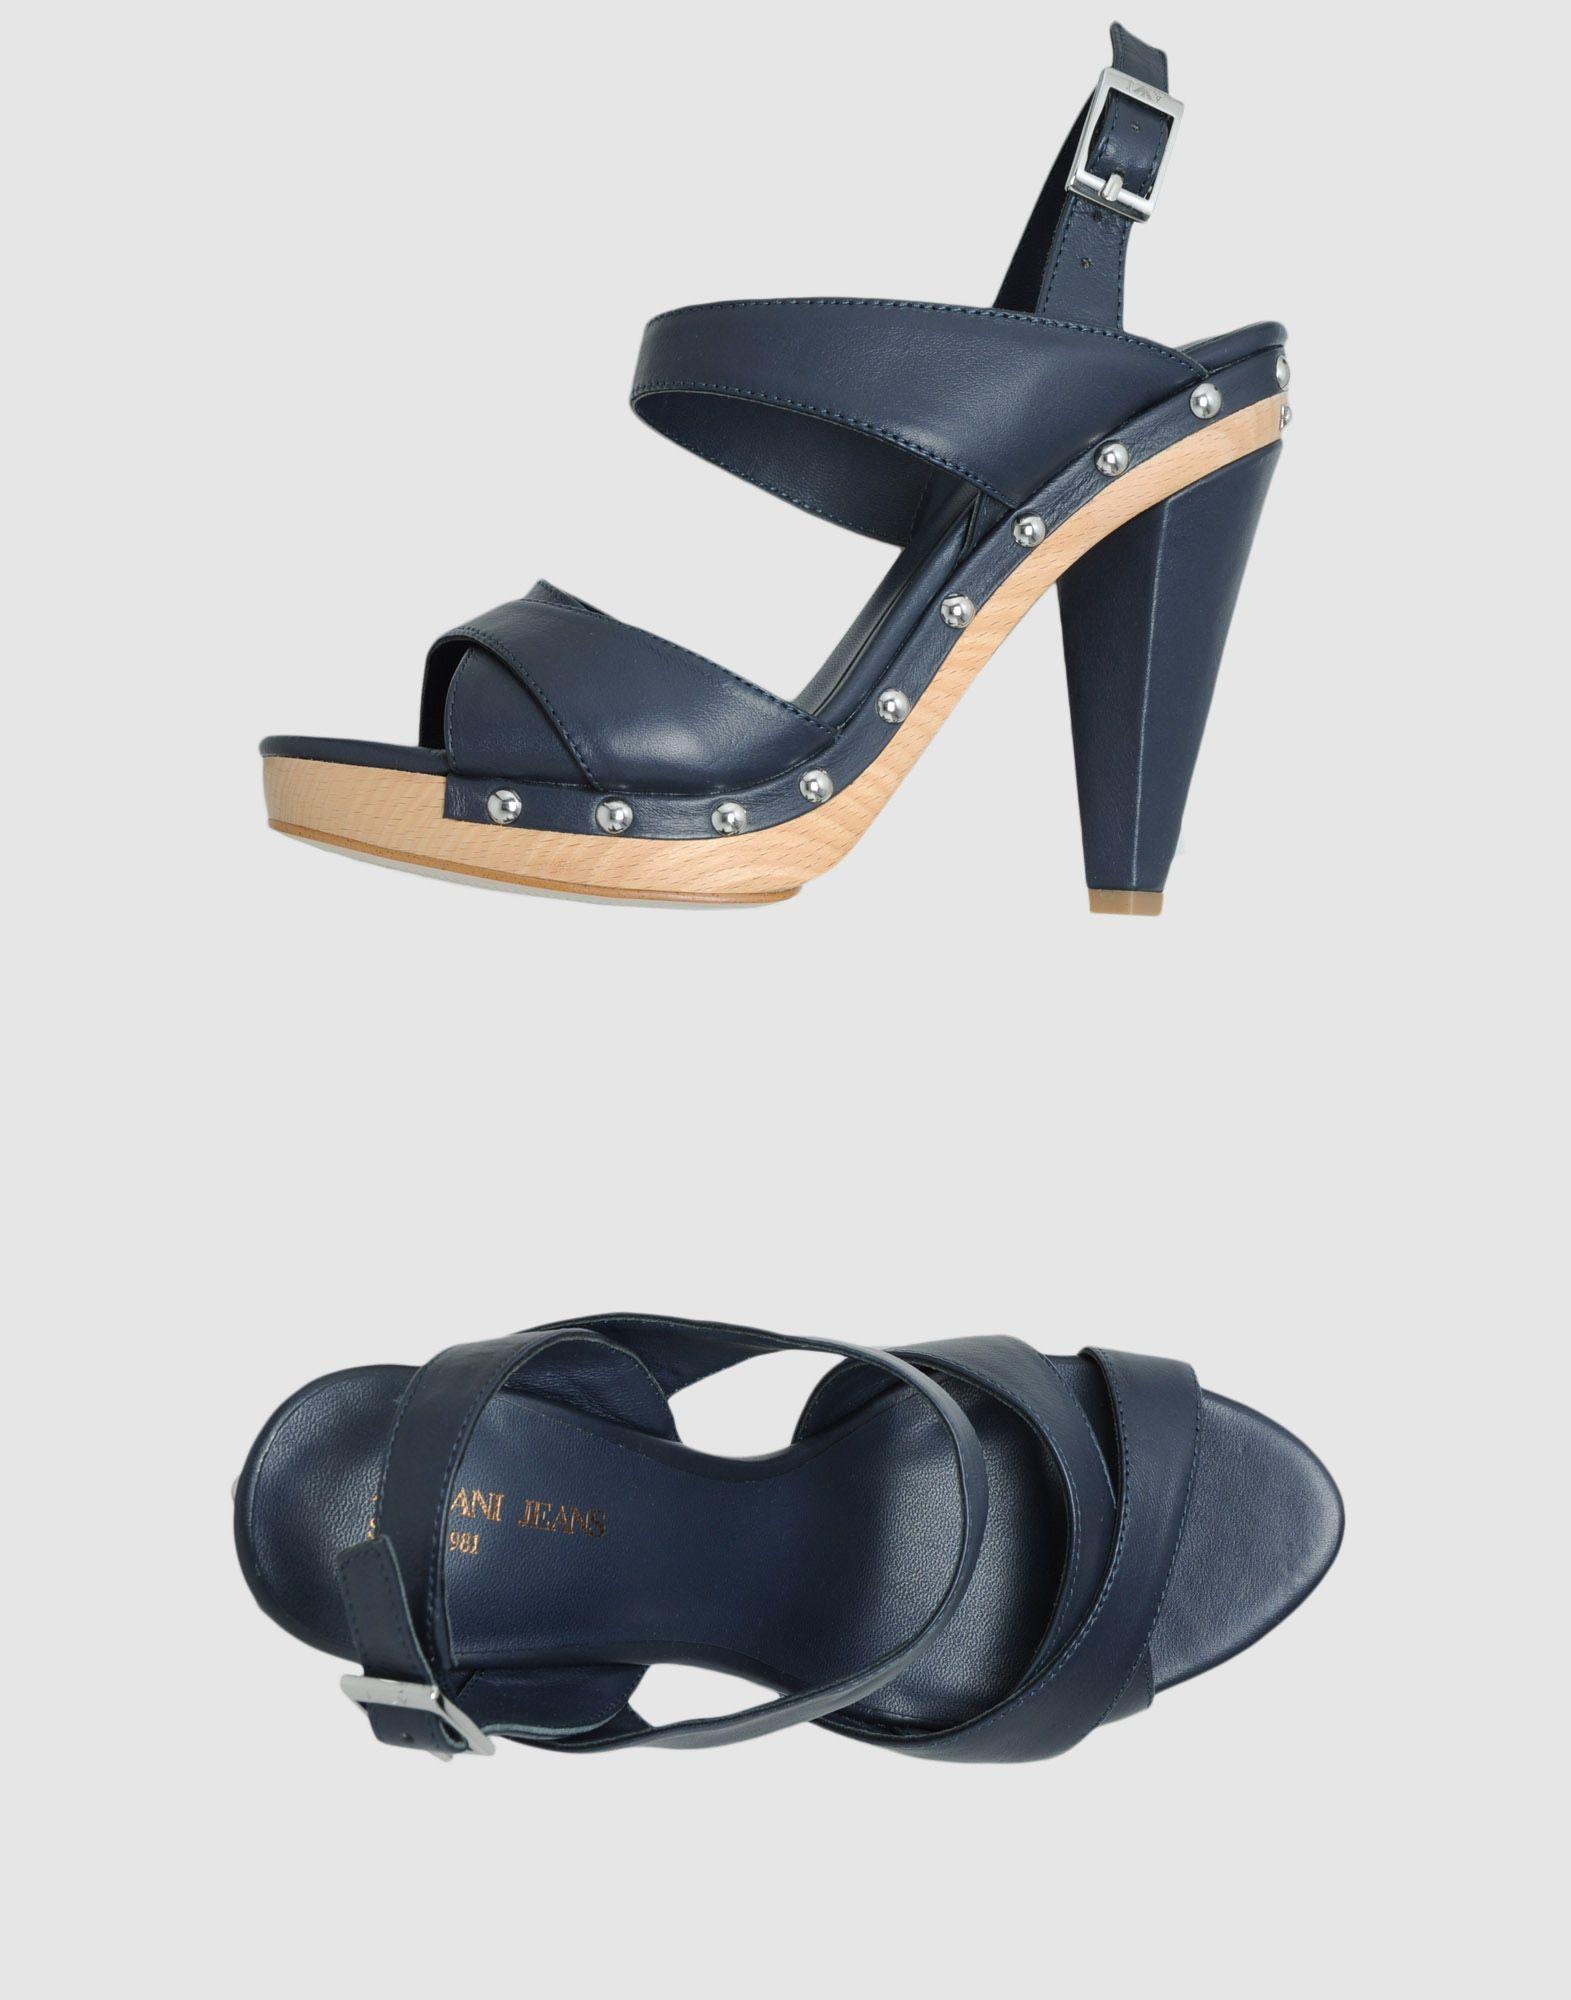 5c179aec5 Armani Jeans Platform Sandals in Blue